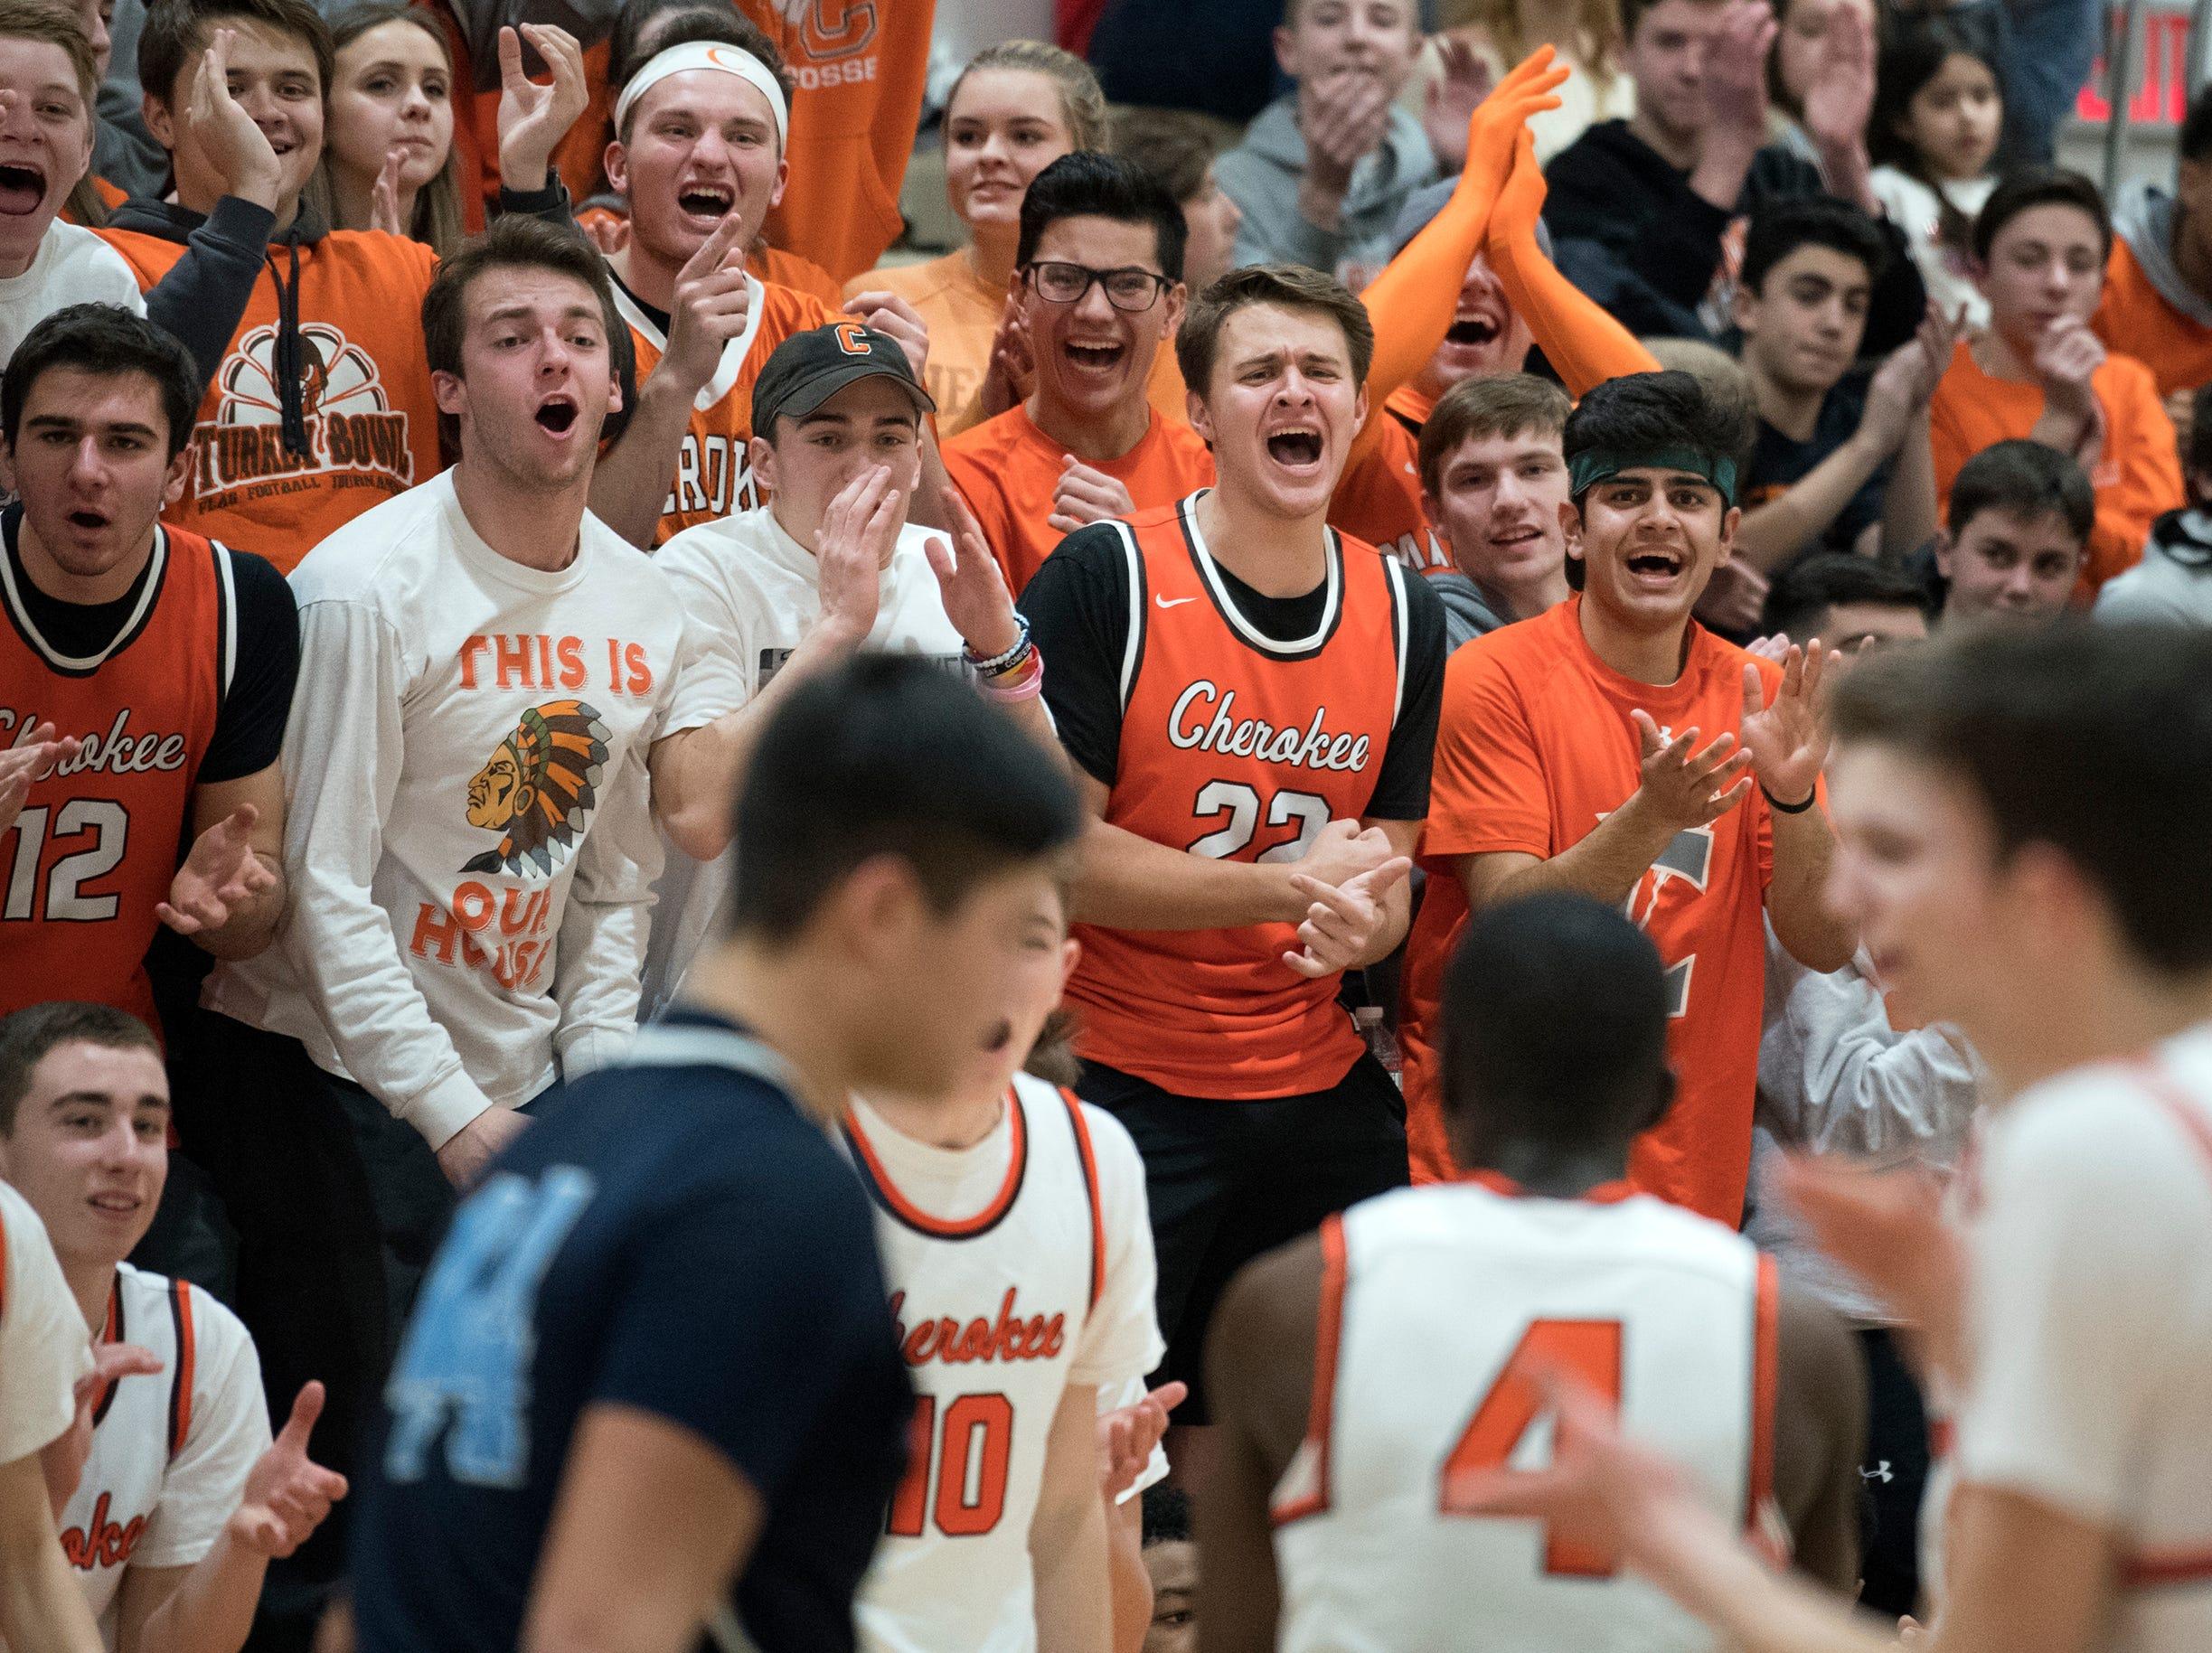 Cherokee fans cheer during a game against Shawnee Monday, Feb. 25, 2019 at Cherokee High School in Marlton, N.J. Cherokee won 54-38.